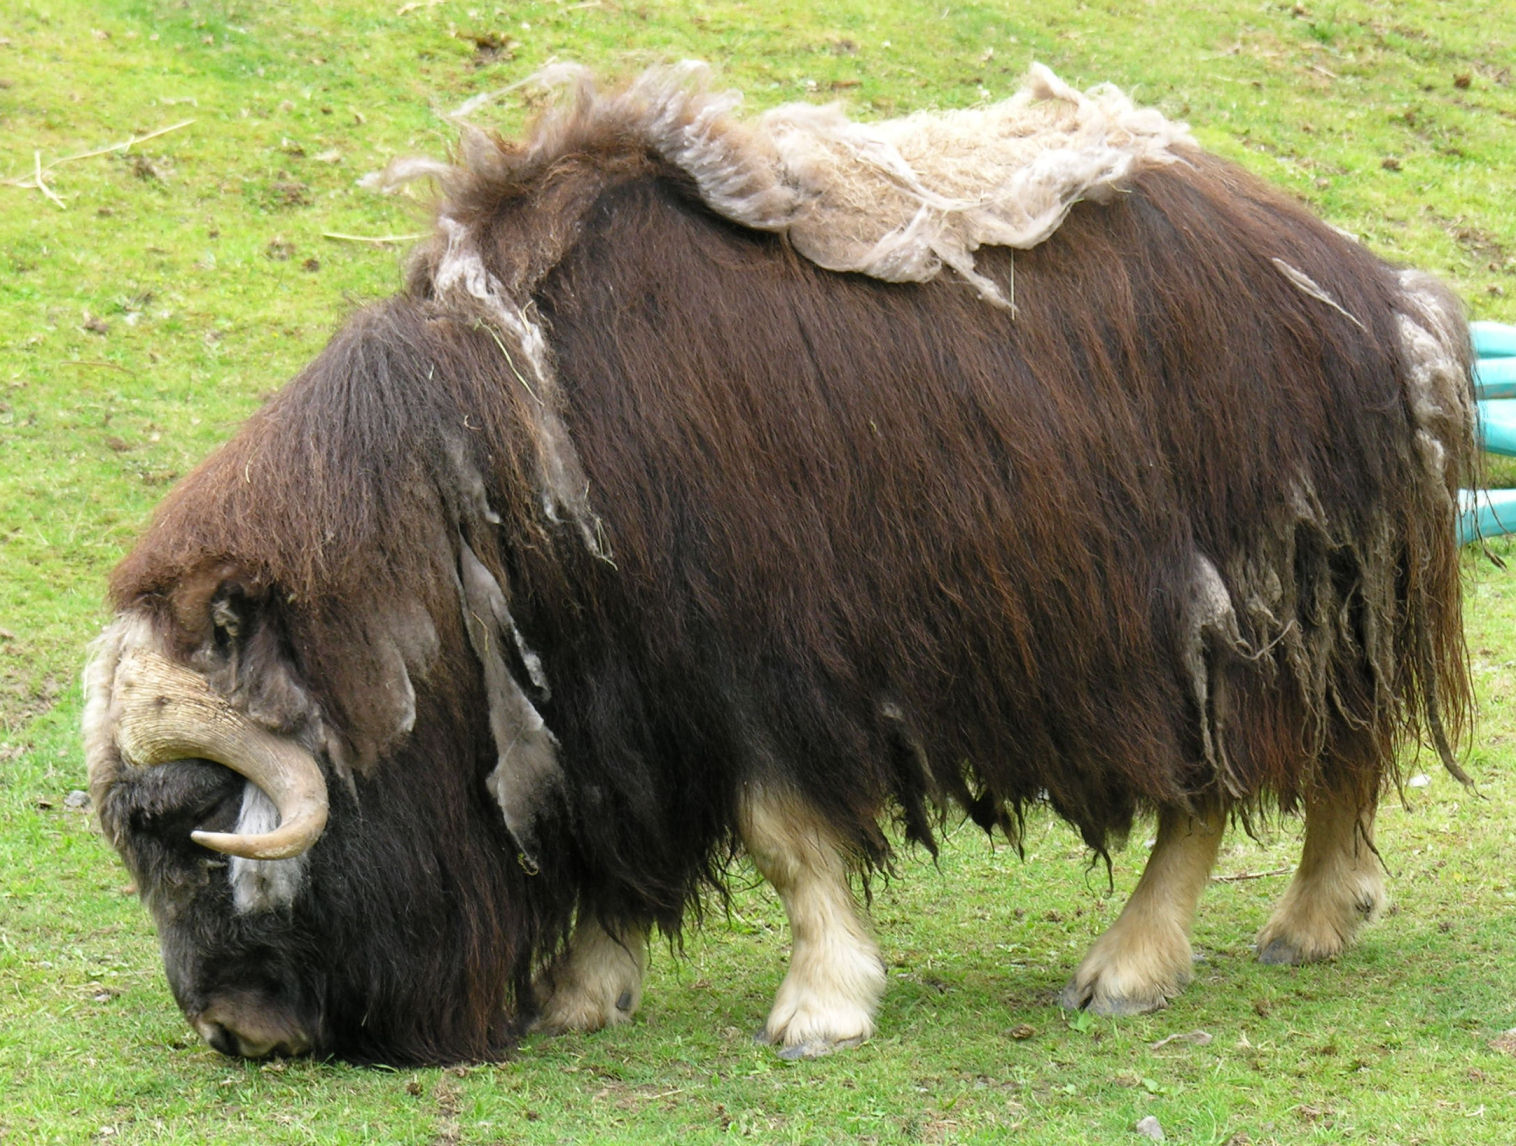 Ox And Bull Food Truck Menu